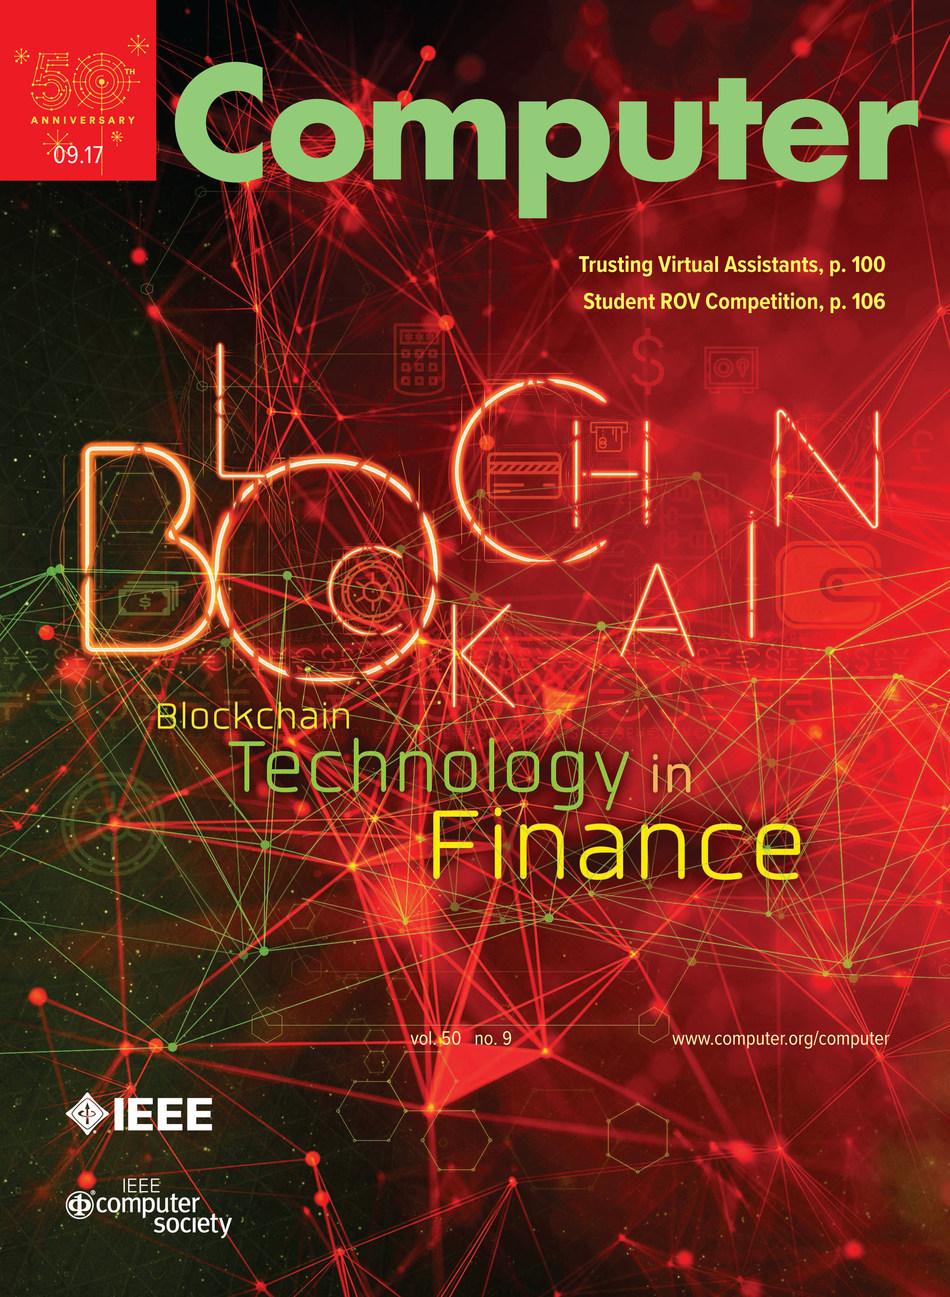 IEEE Computer's Computer Magazine, September 2017 issue, Blockchain Technology in Finance